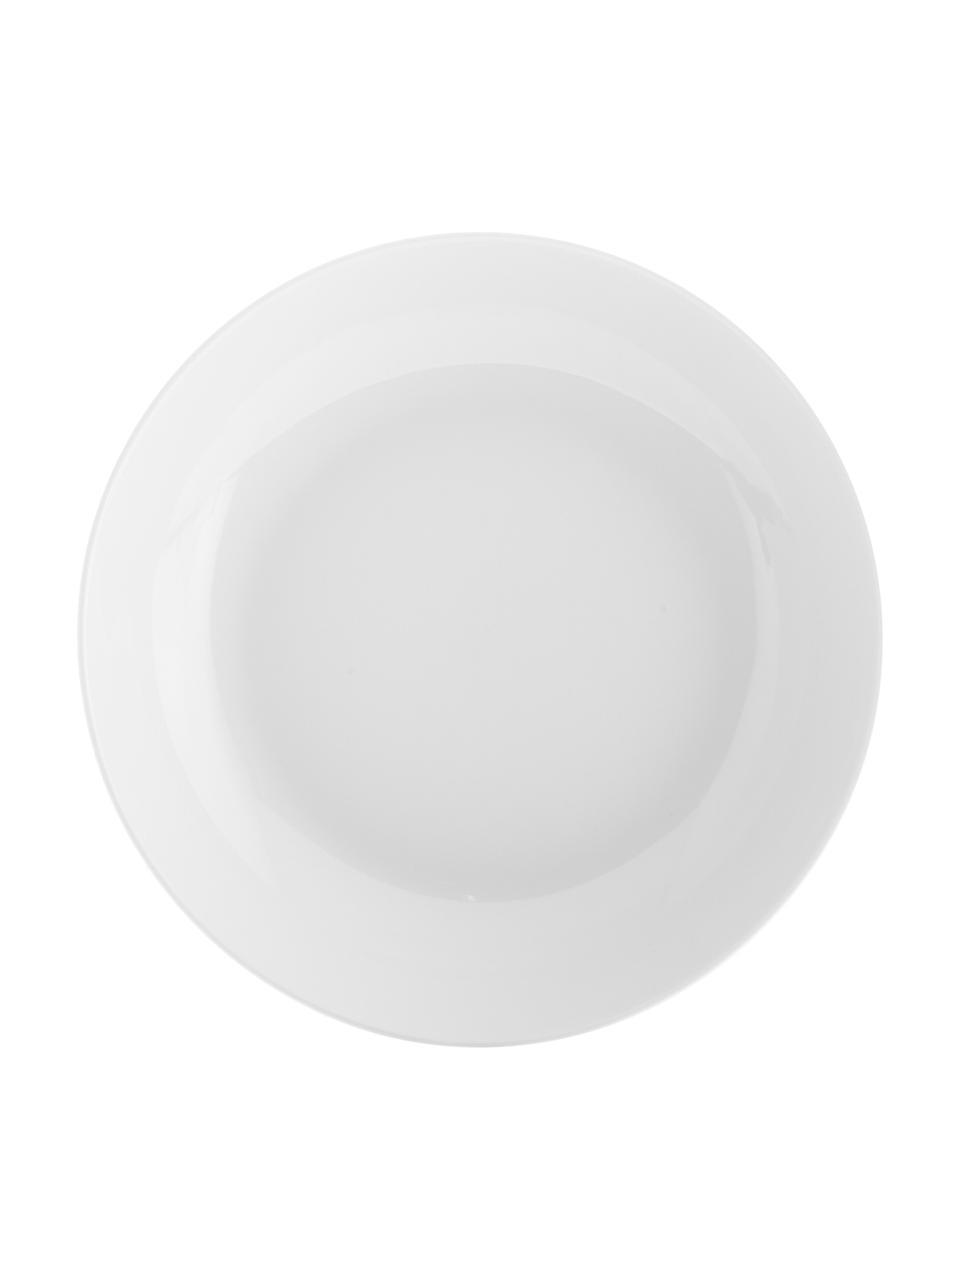 Piatto fondo in porcellana Delight Modern 2 pz, Porcellana, Bianco, Ø 21 x Alt. 4 cm